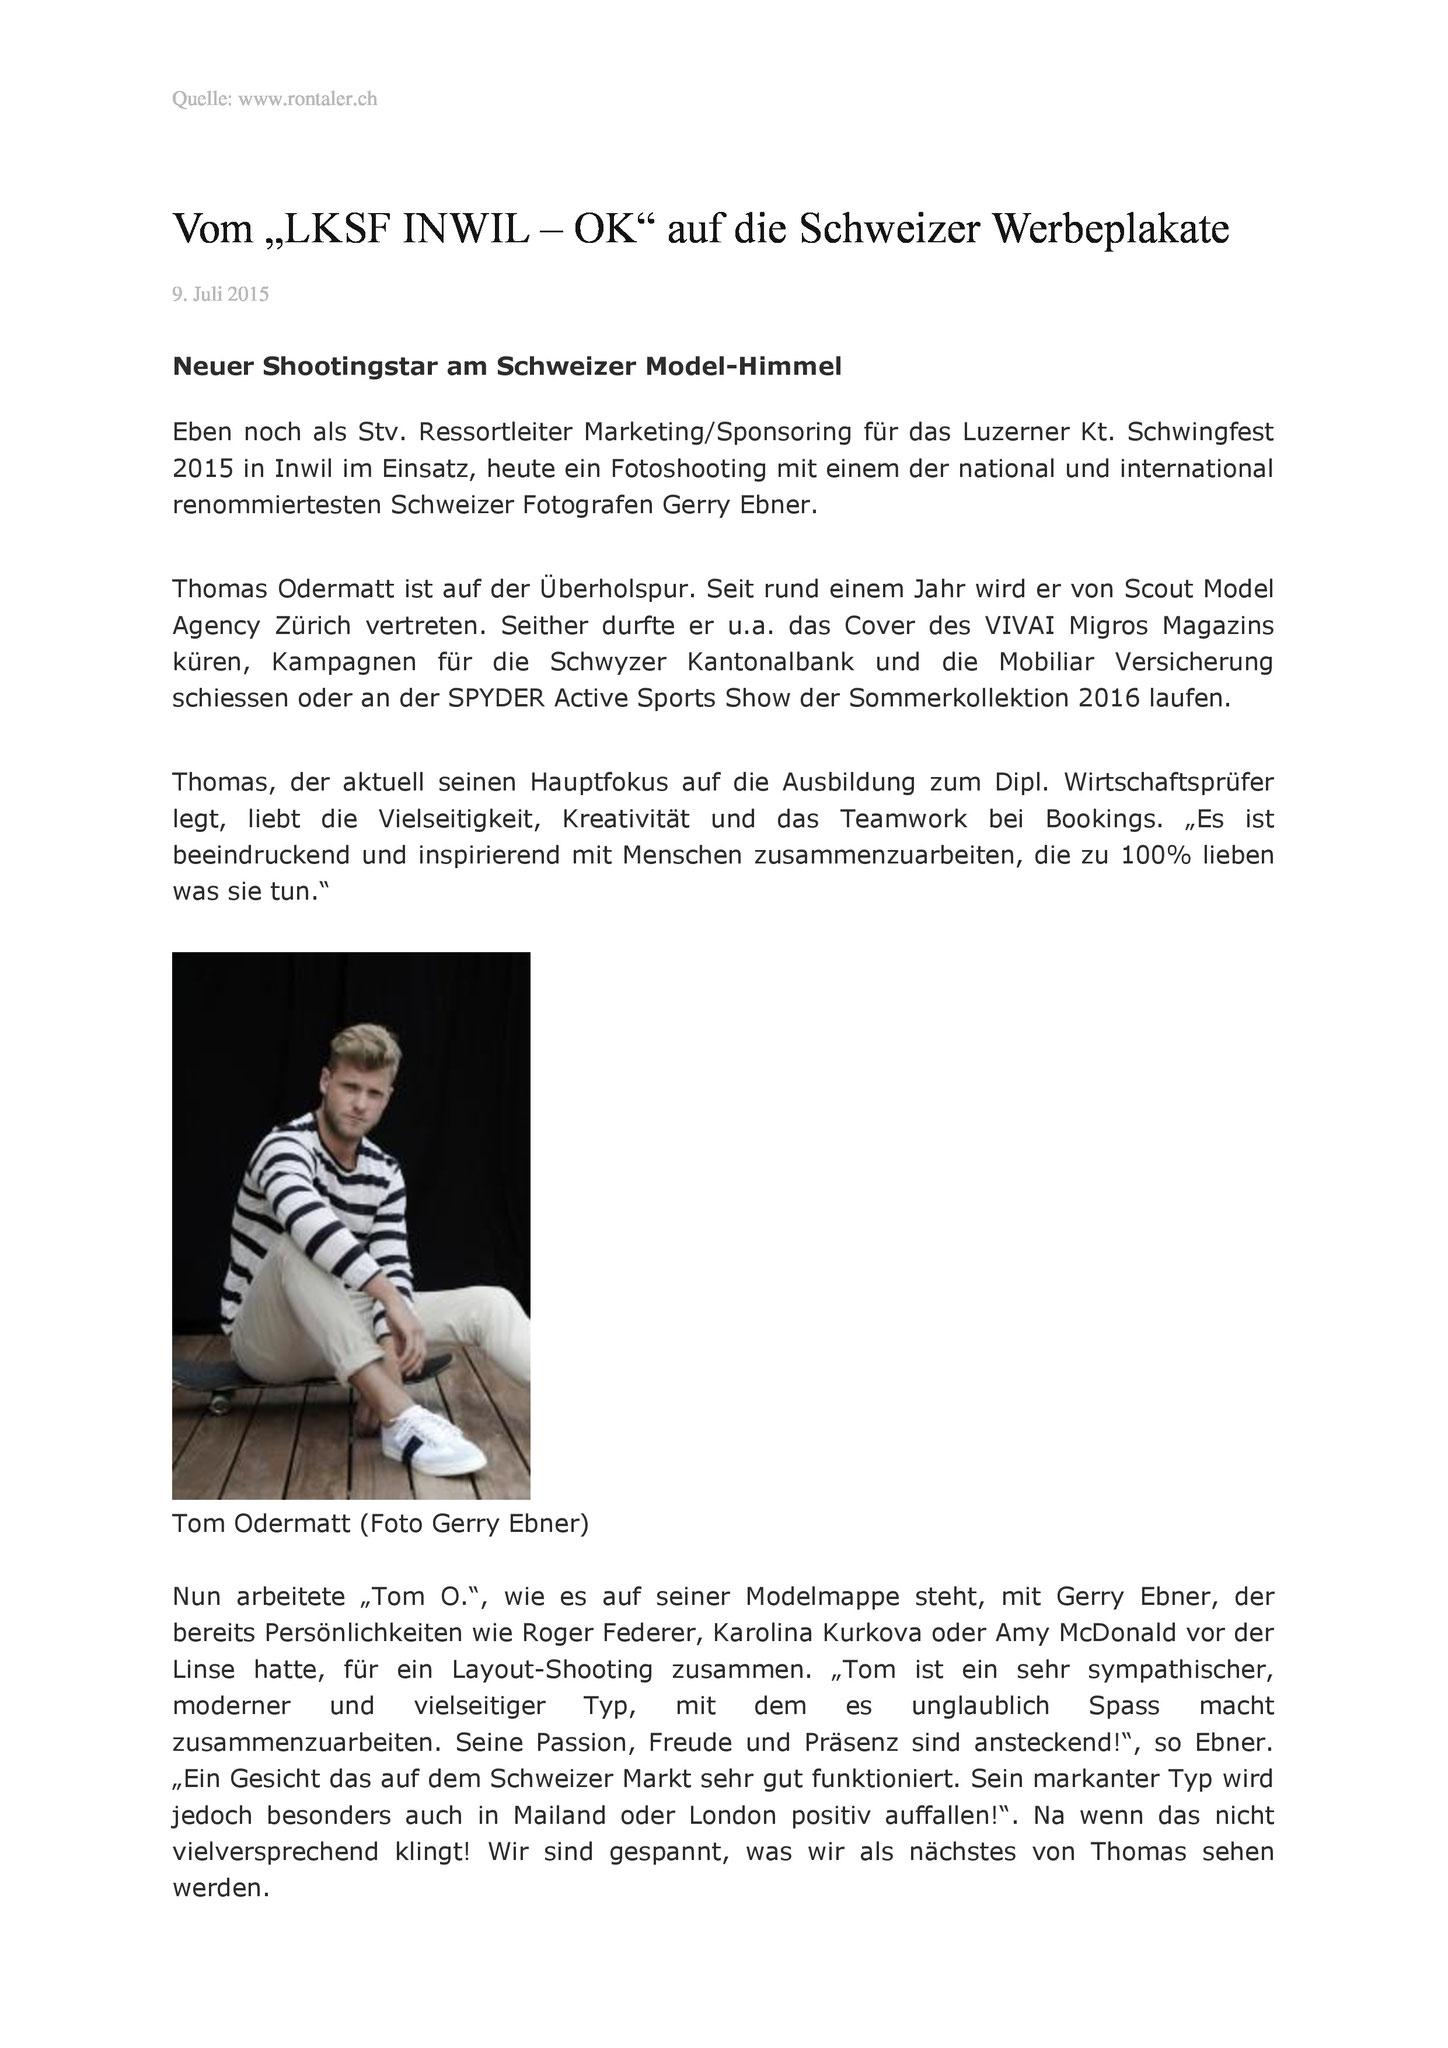 Rontaler Gerry Ebner Model Thomas Odermatt